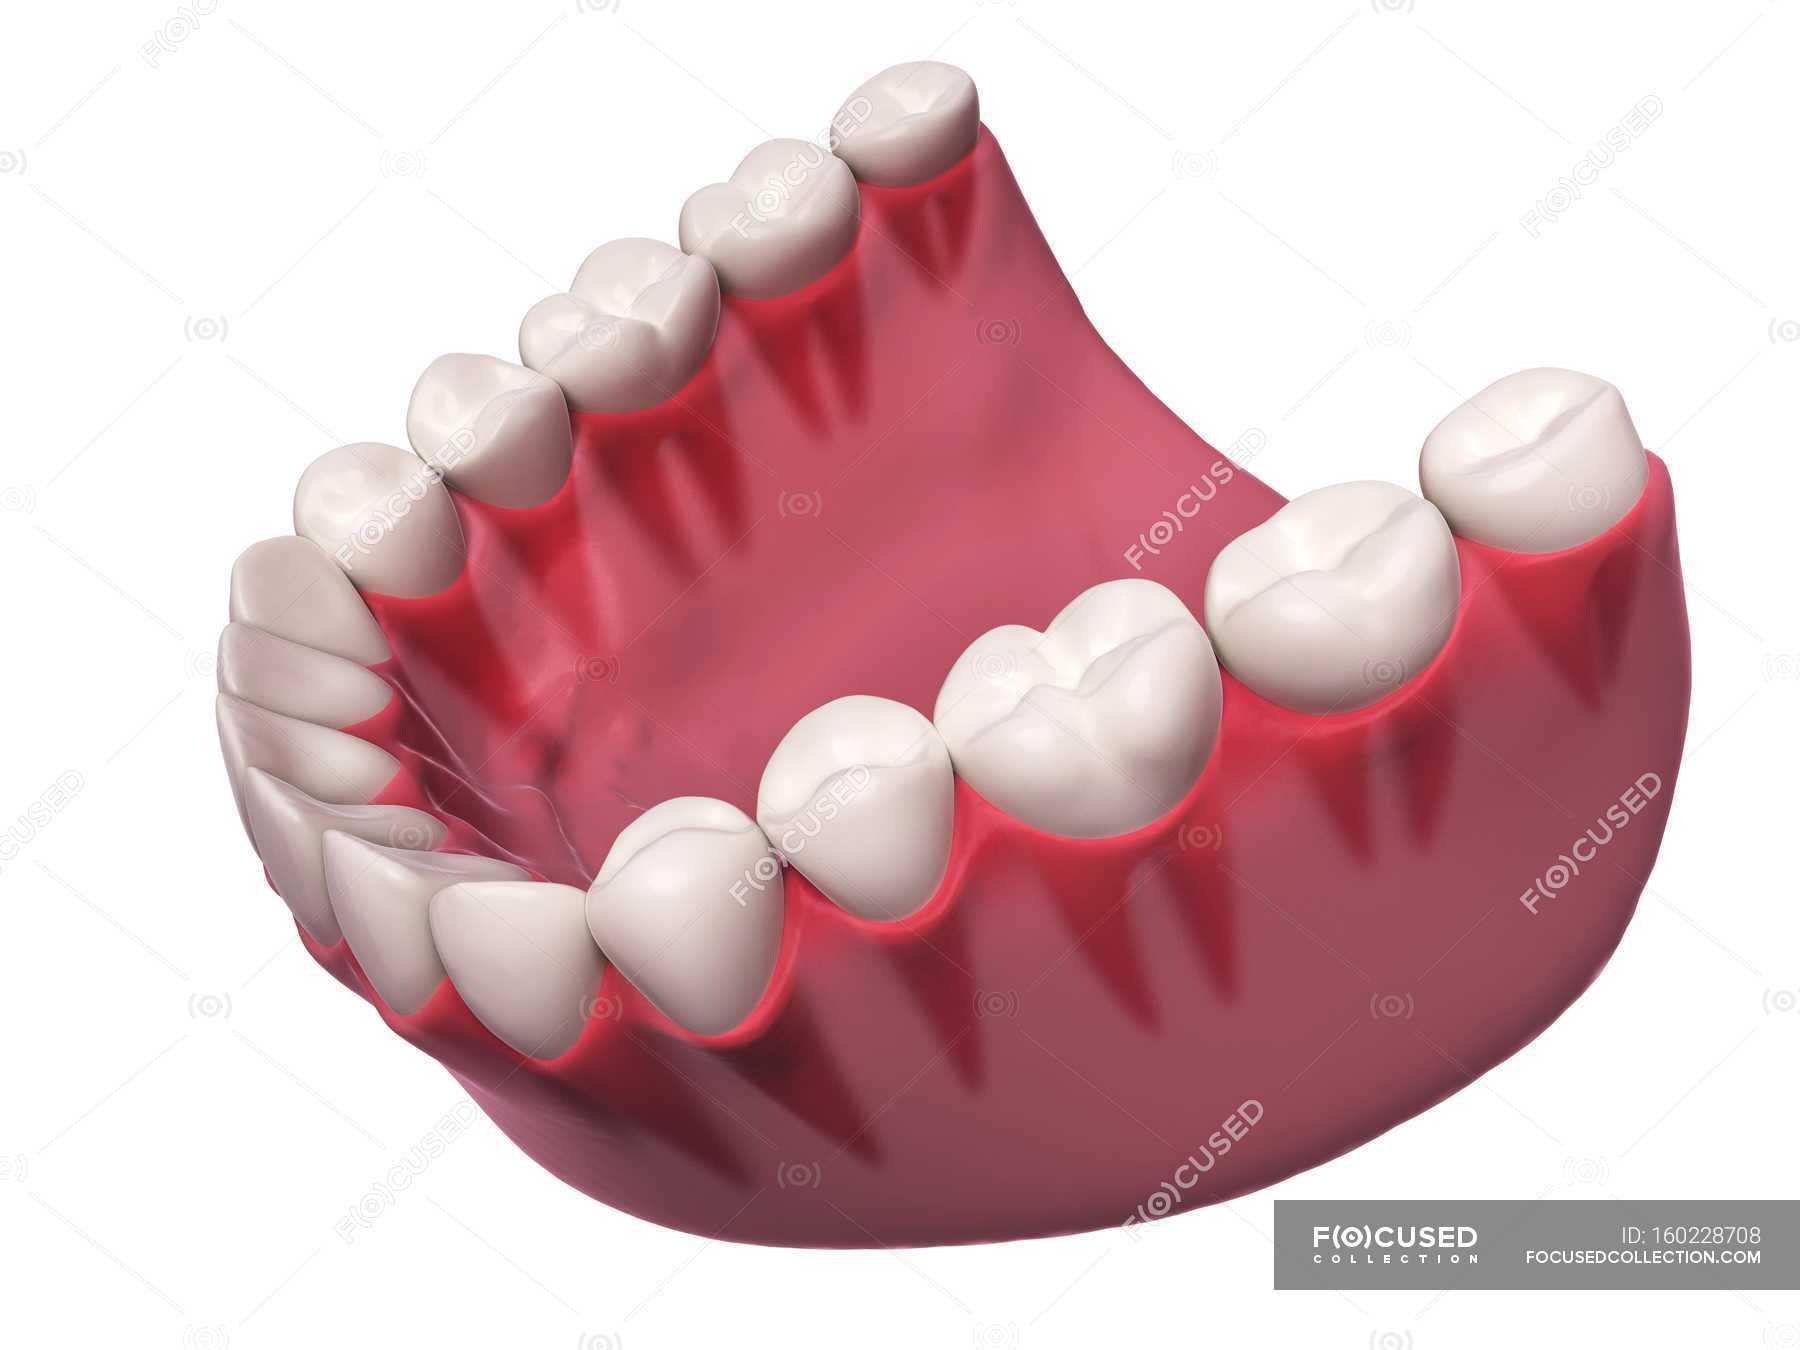 Human Teeth Anatomy Stock Photo 160228708